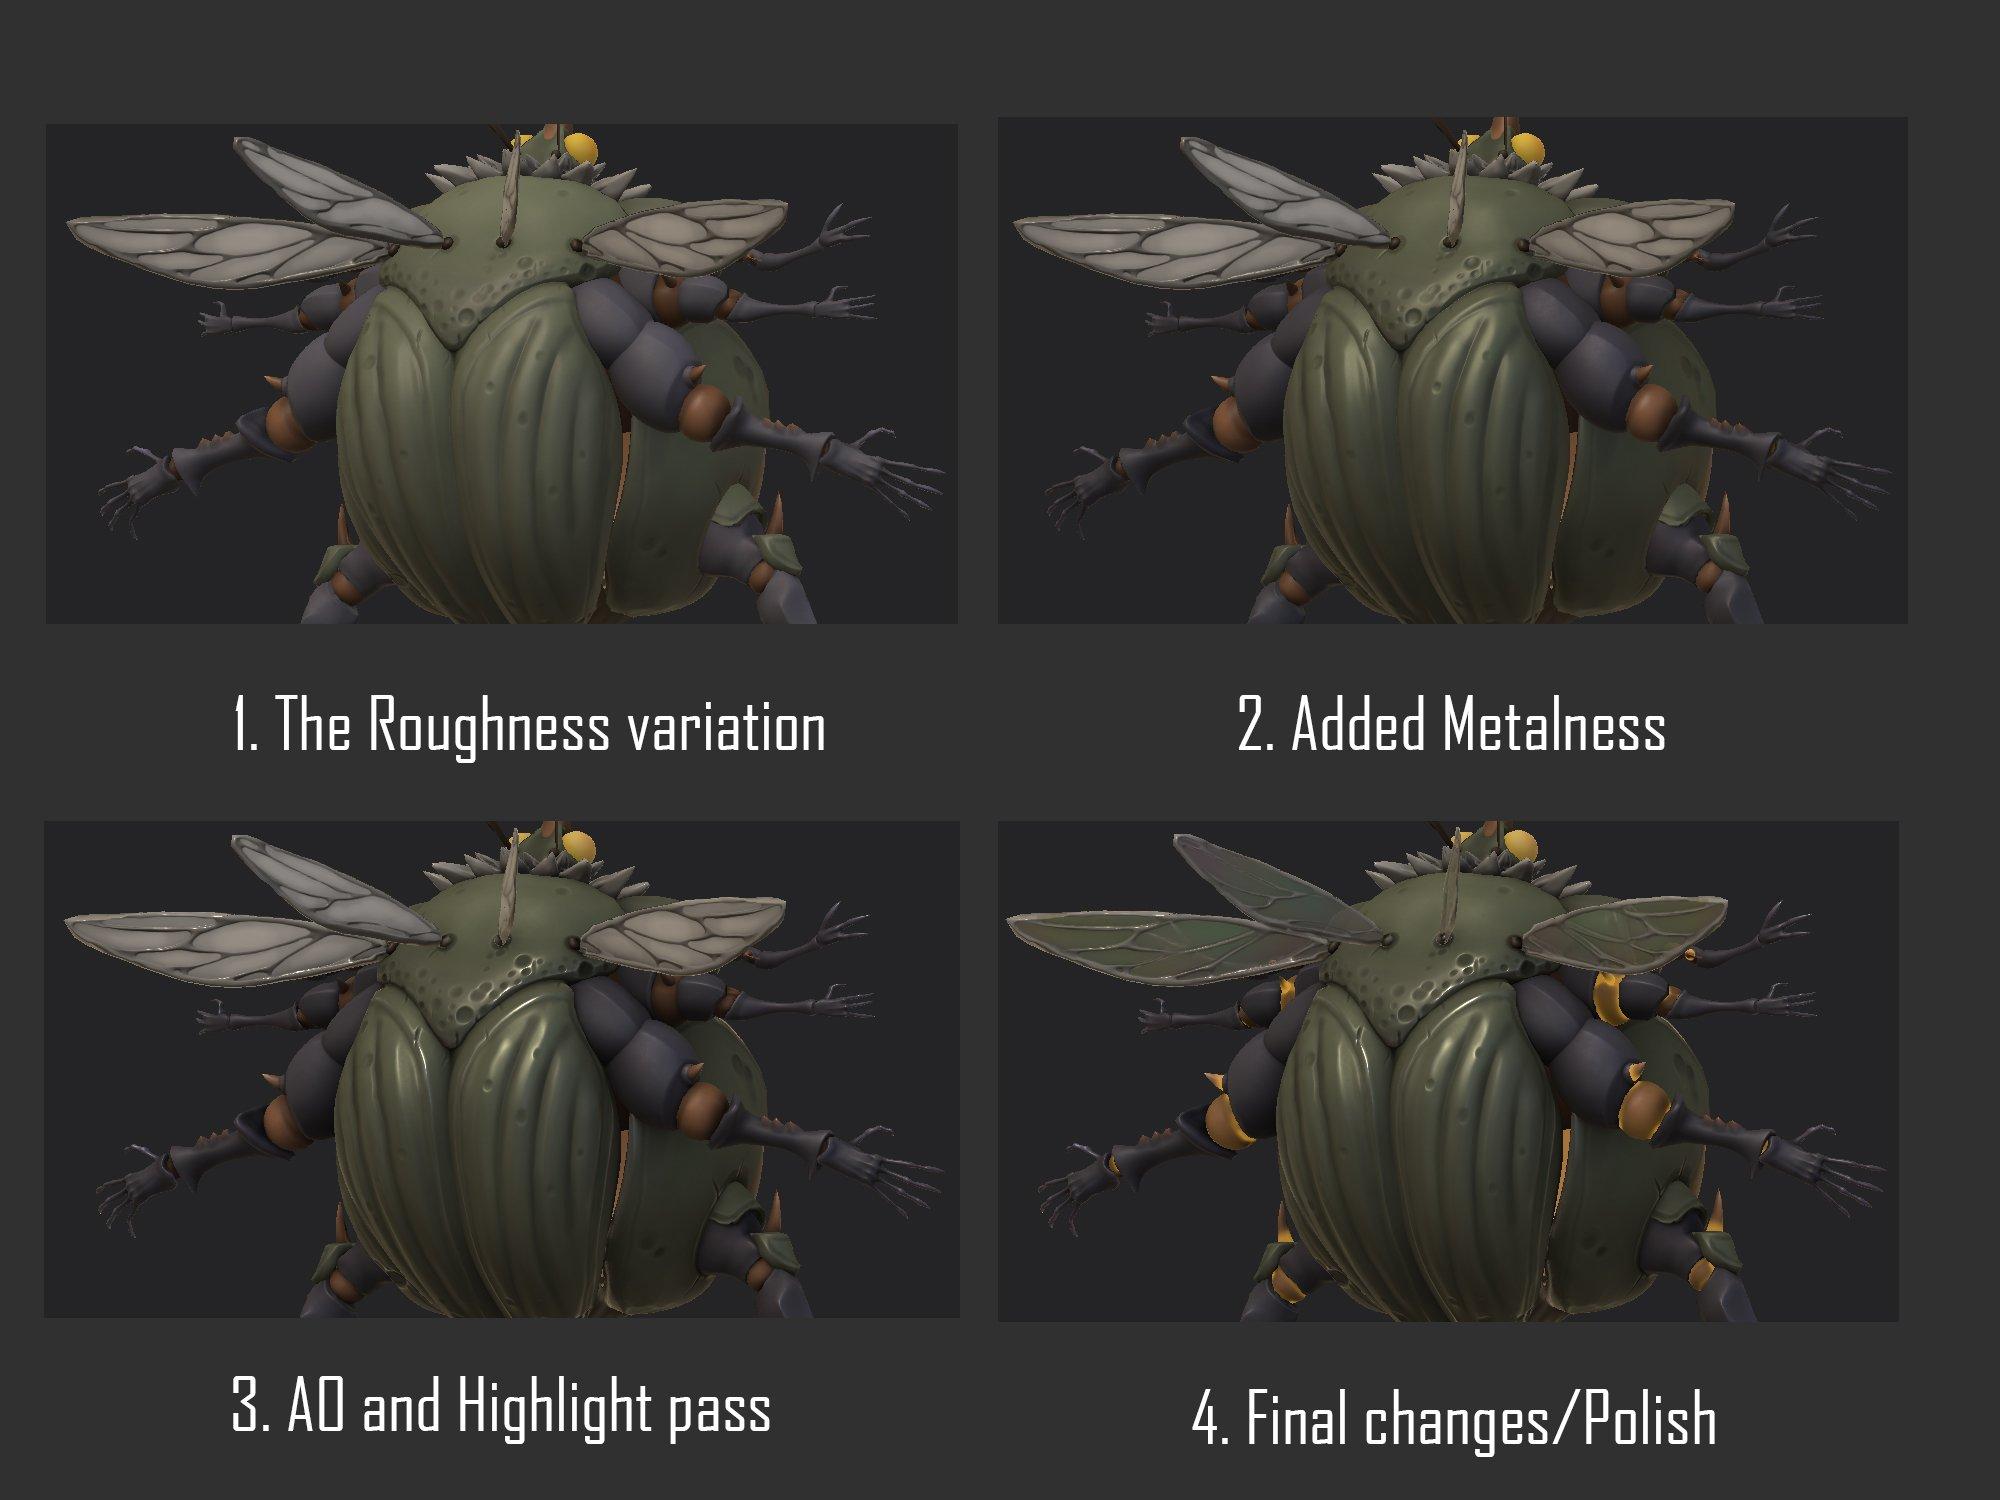 big buggus materials image